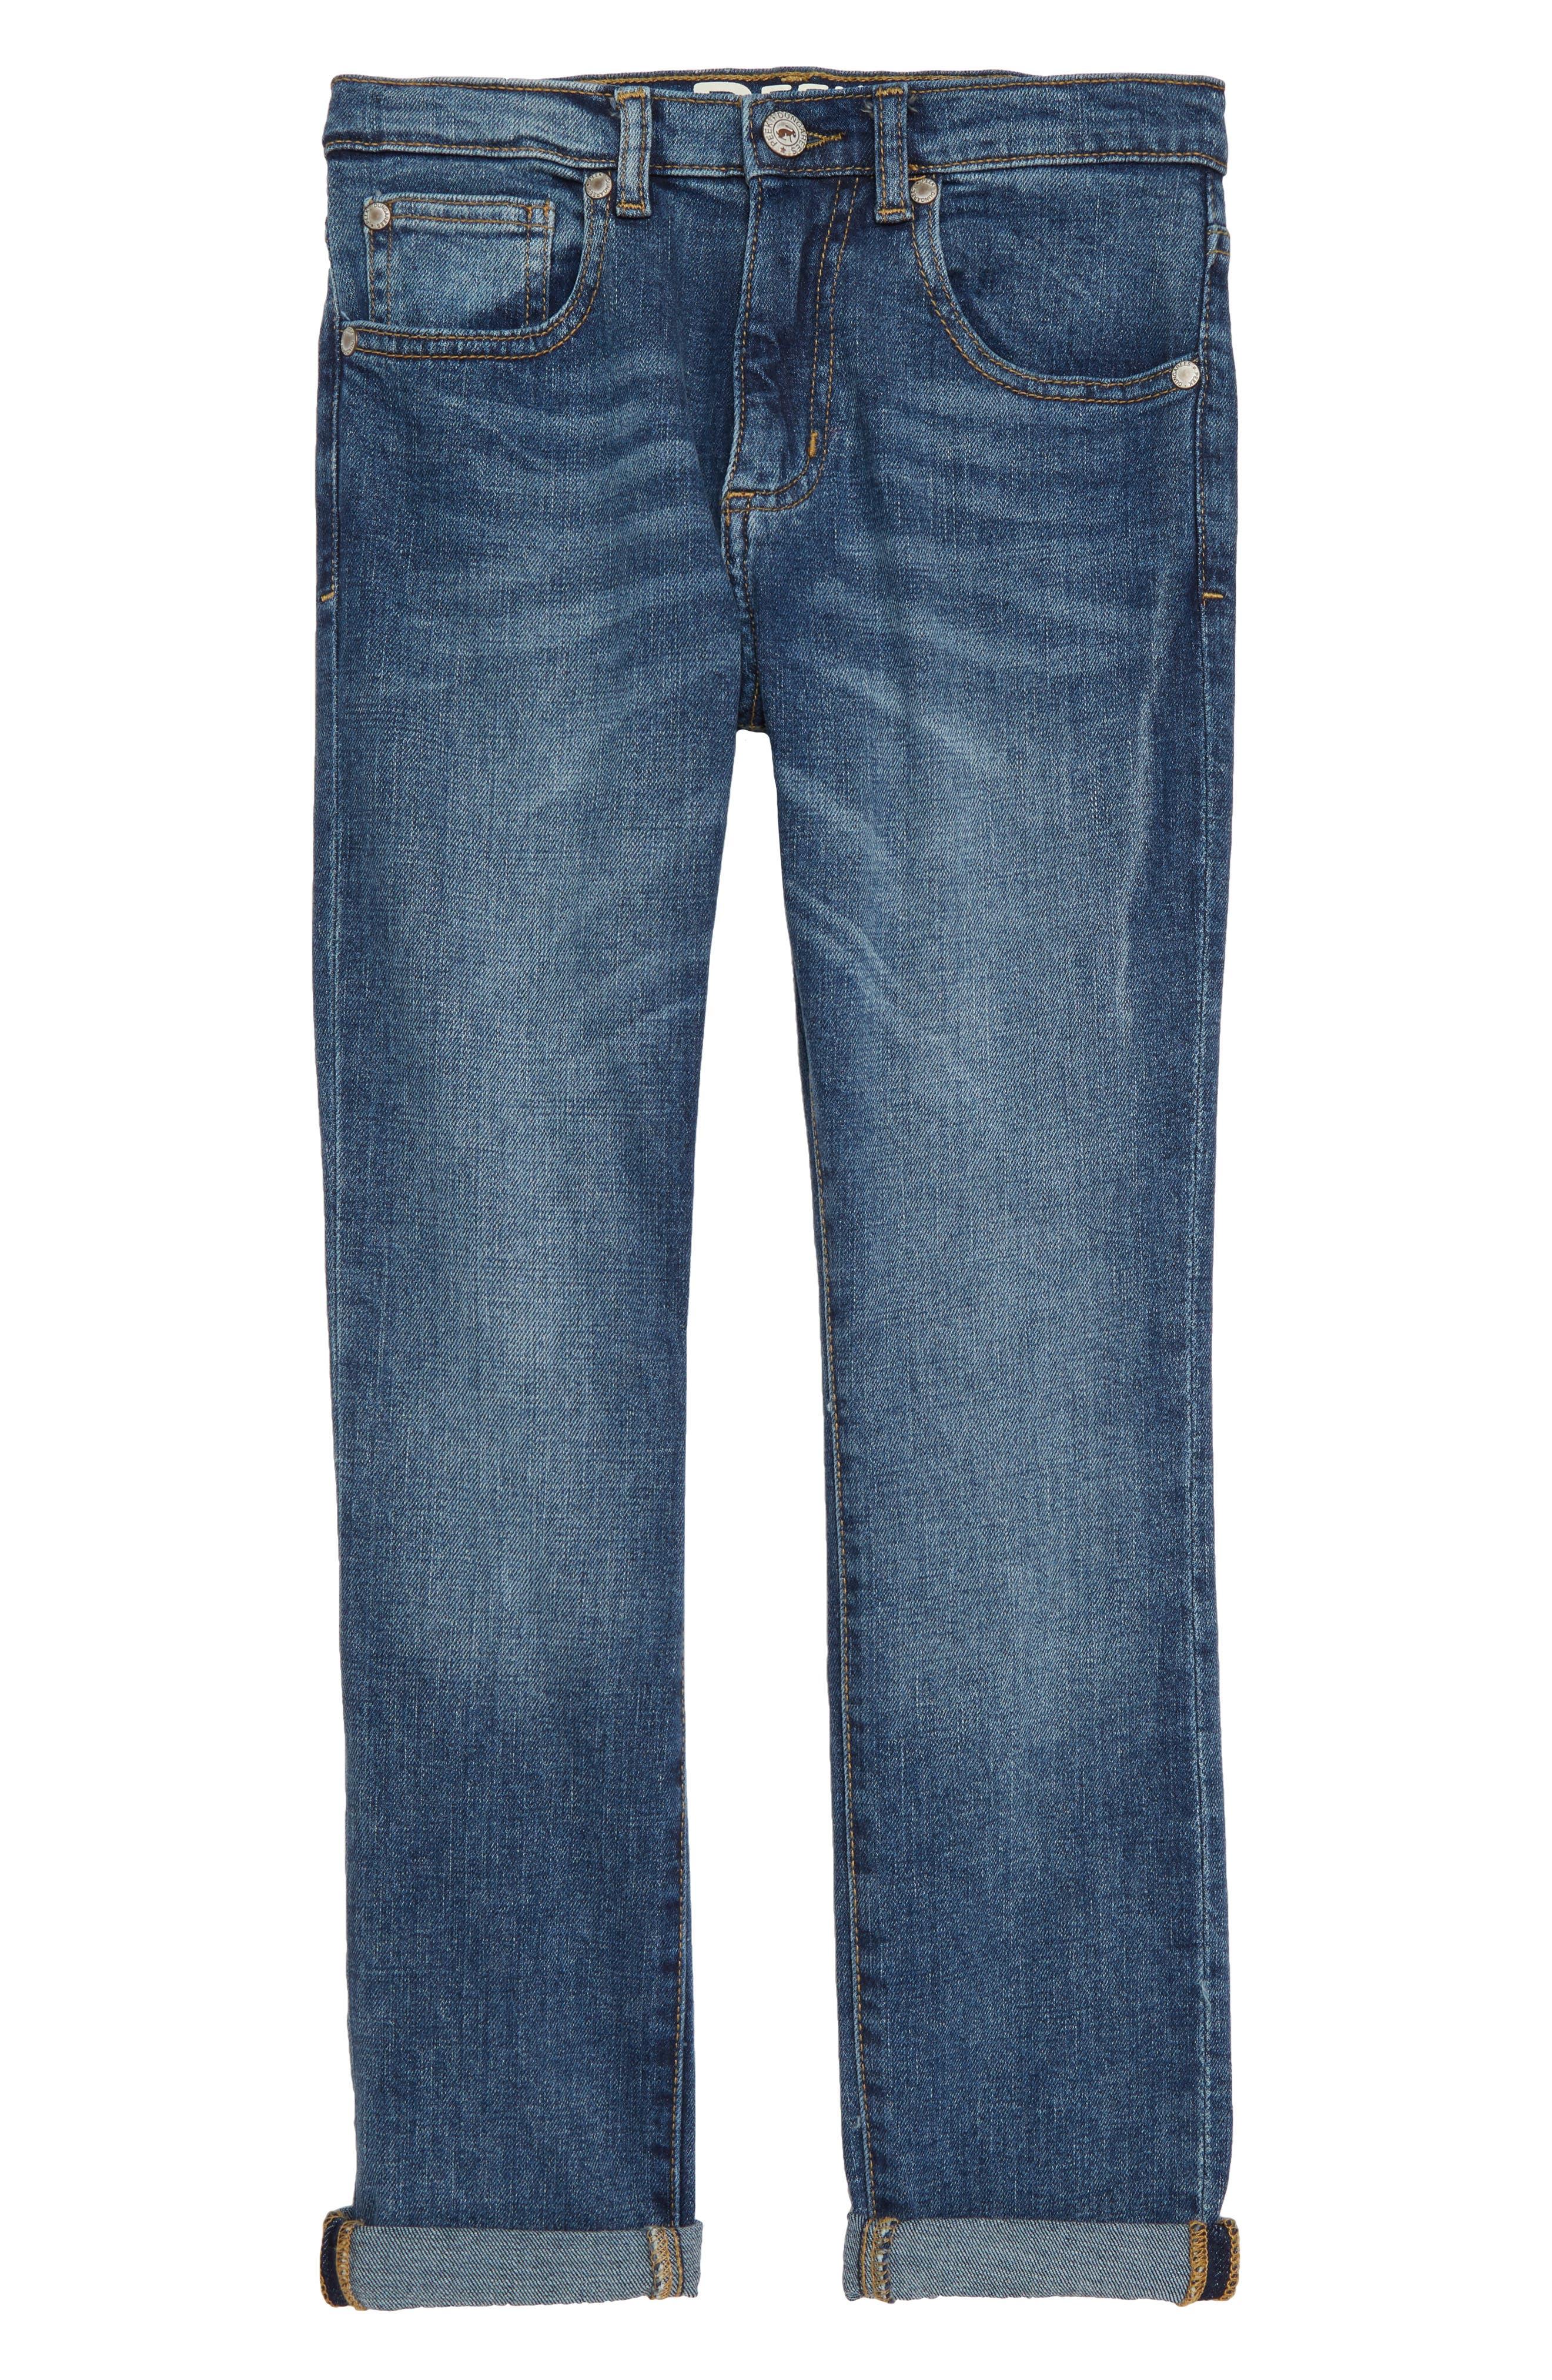 Slouch Jeans,                             Main thumbnail 1, color,                             MEDIUM WASH